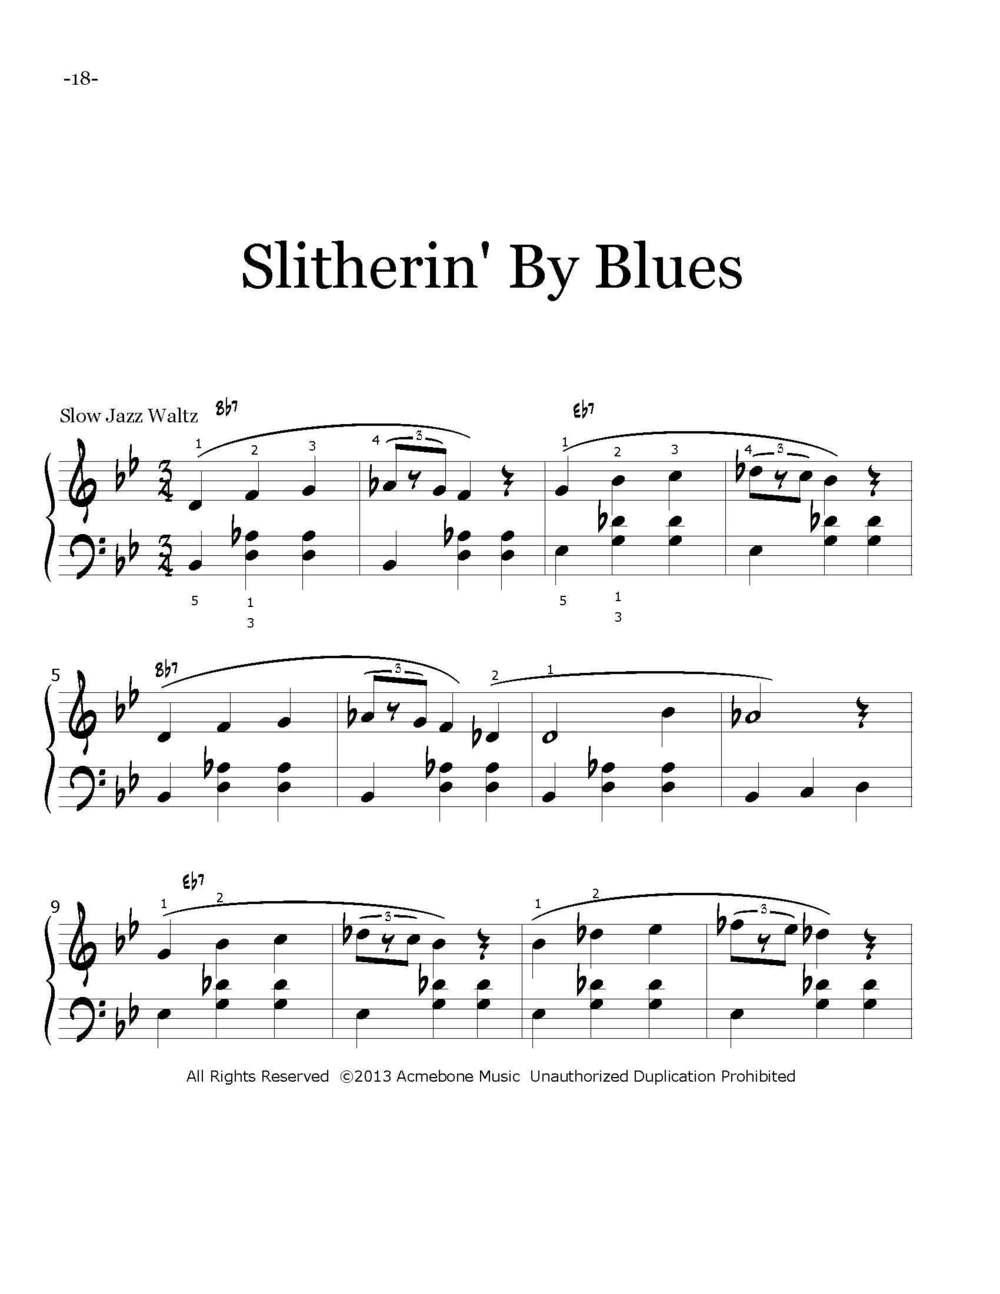 Progressive Jazz Etudes for Piano bk1 for web_Page_19.jpg